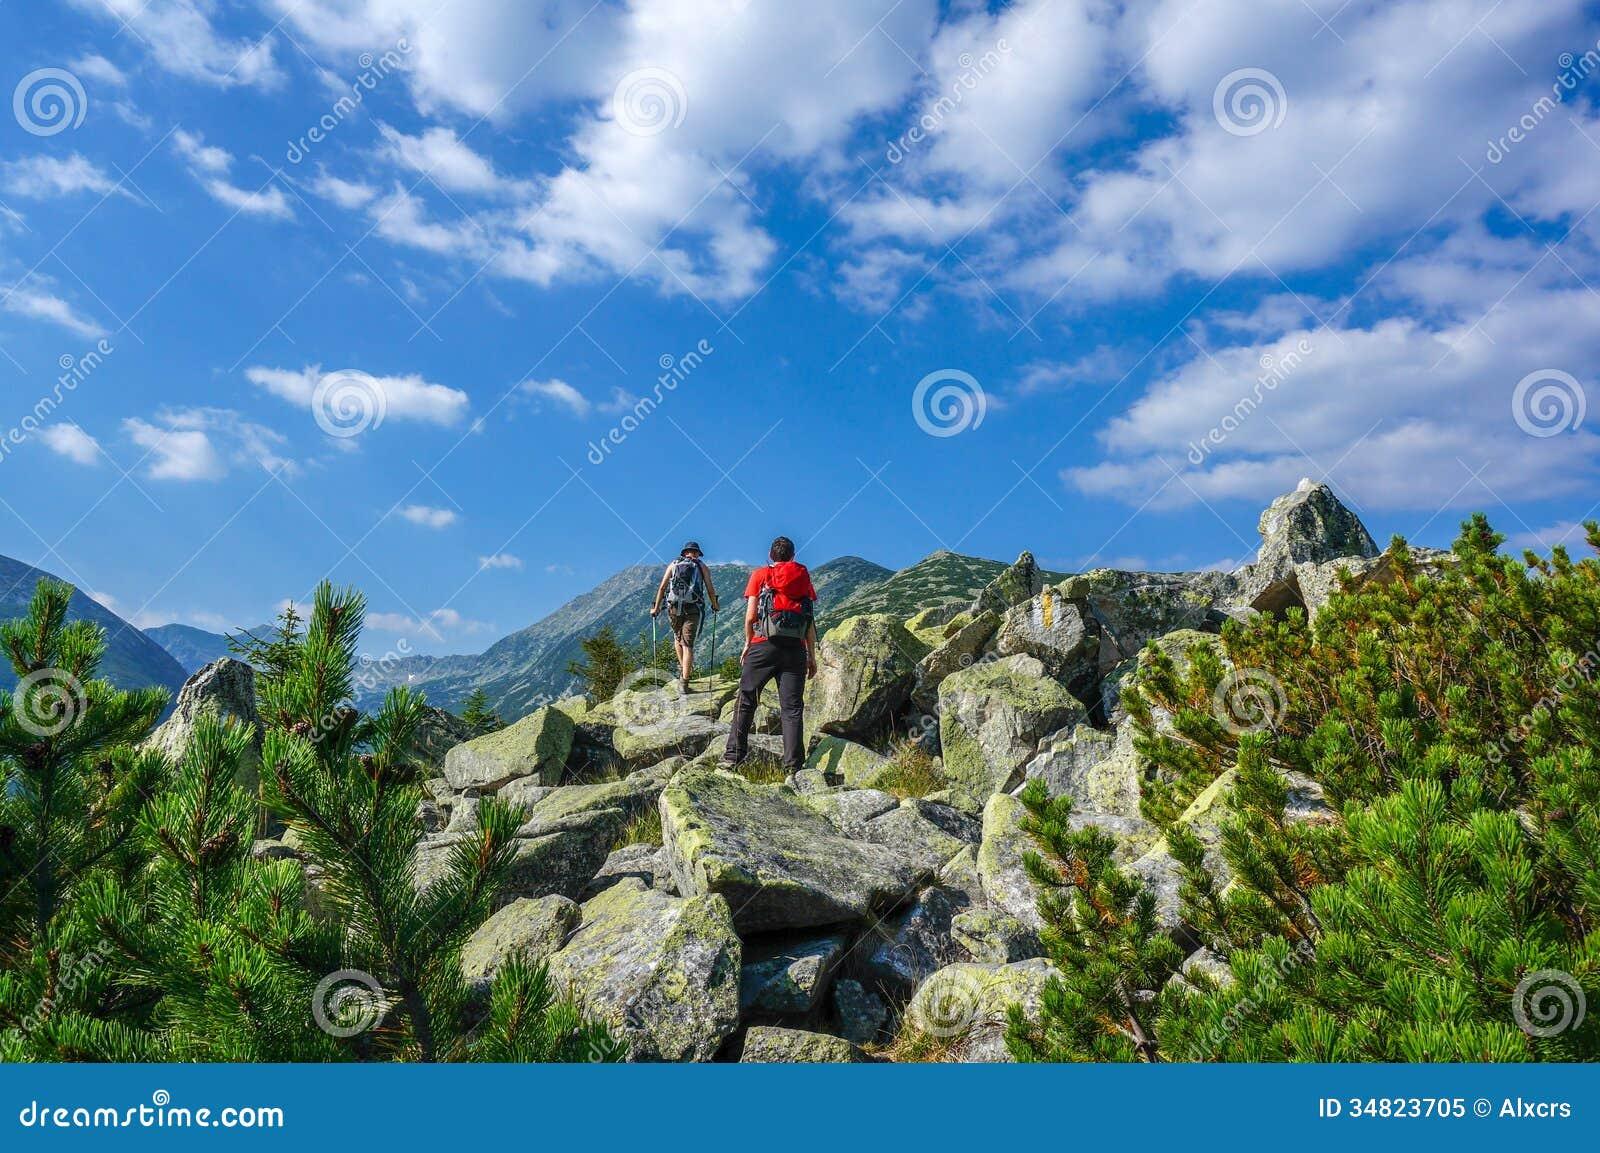 Two Men Hiking Stock Image Image Of Mountaineer Rocks